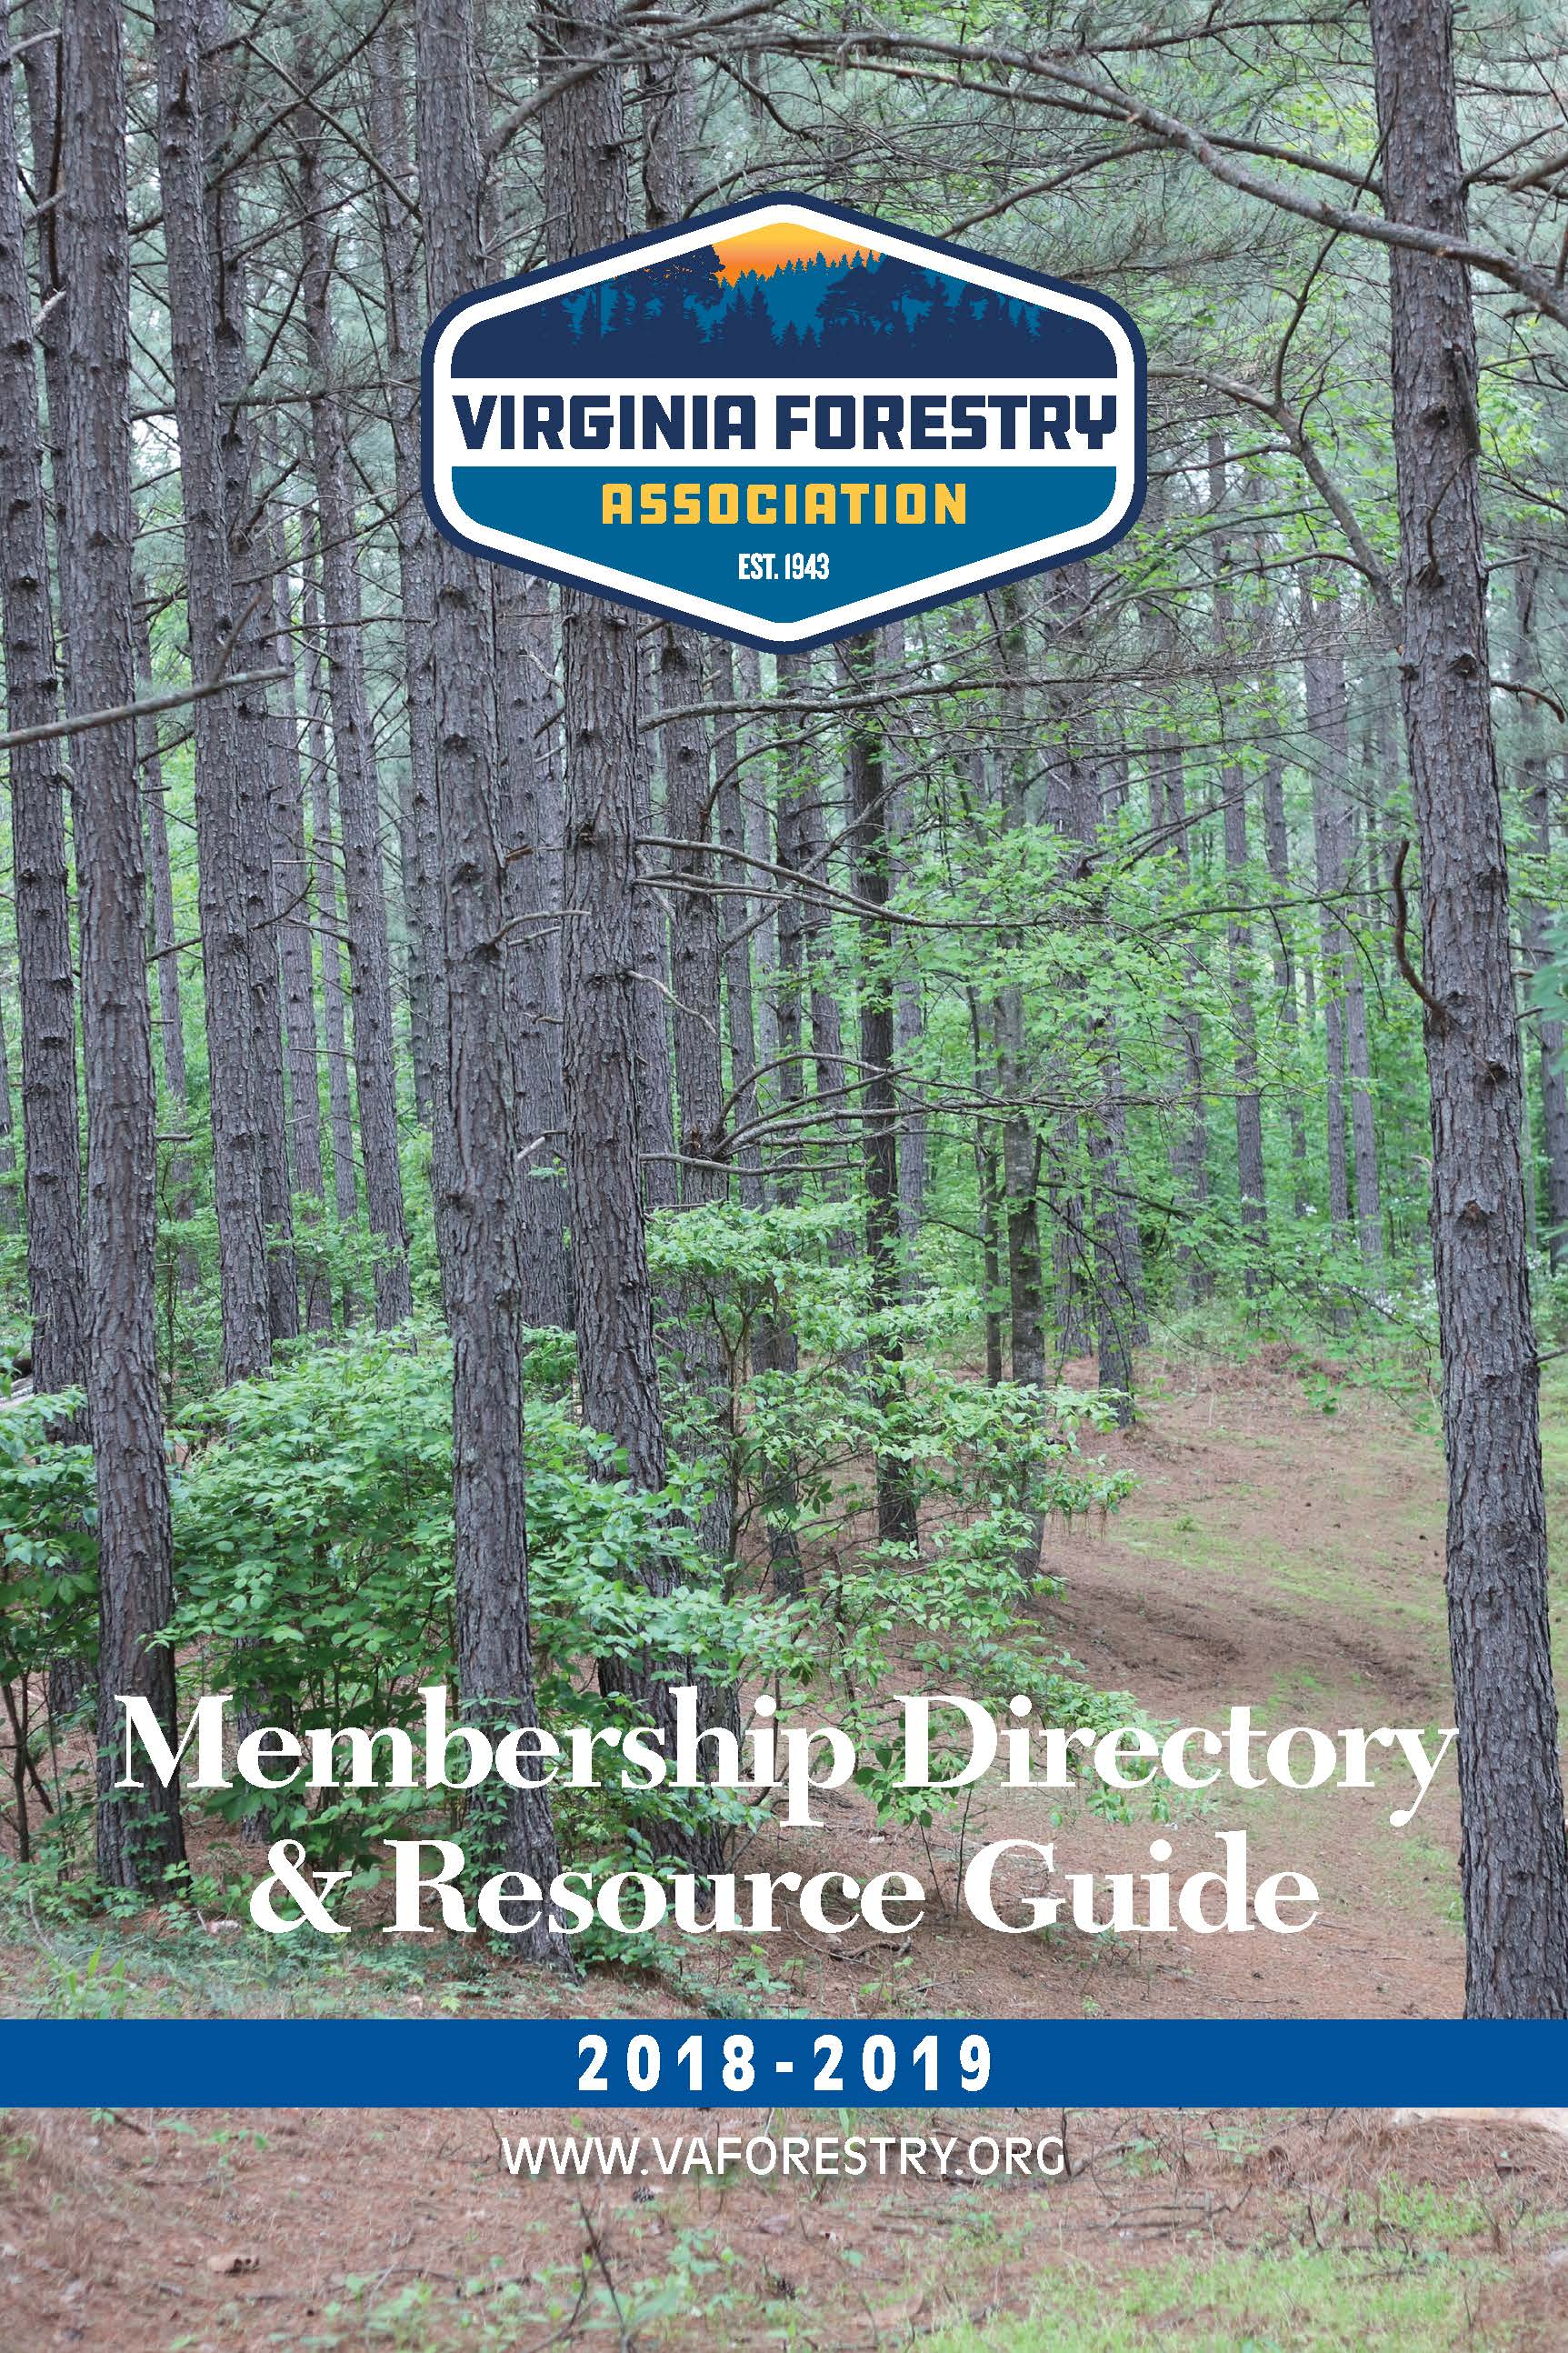 2018-2019 Directory